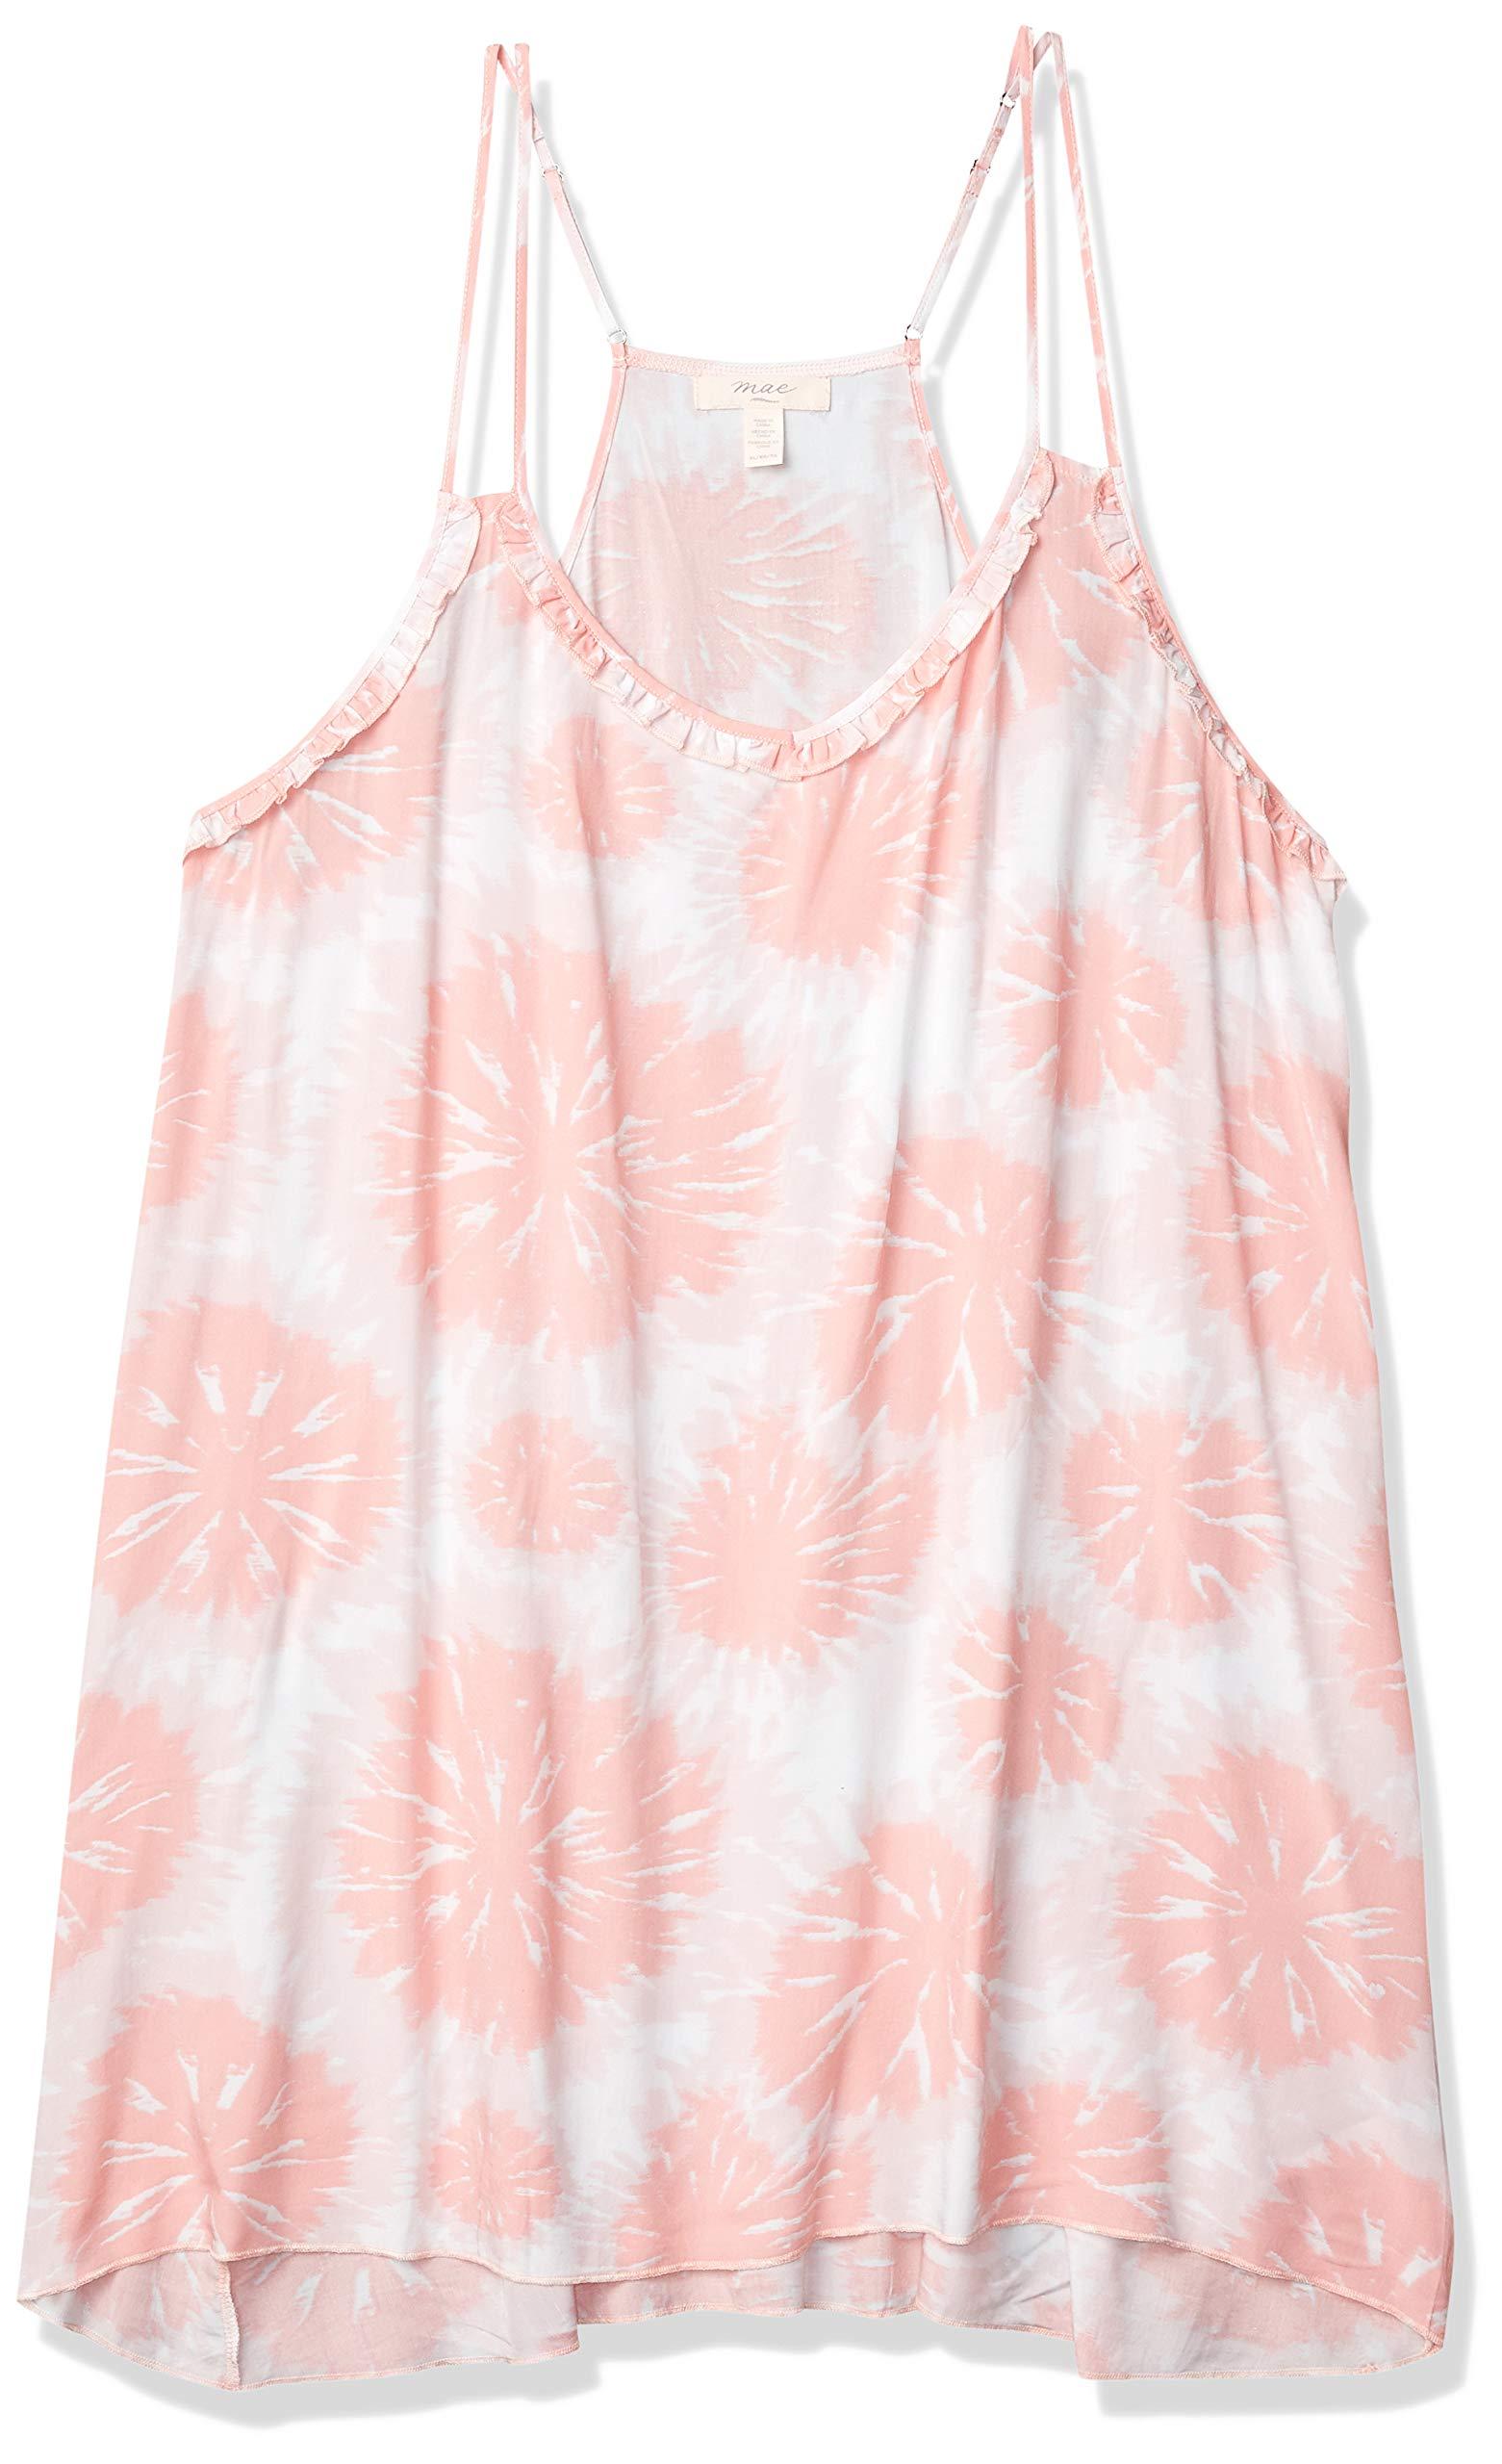 Amazon Brand - Mae Women's Sleepwear Printed Chemise Nightgown